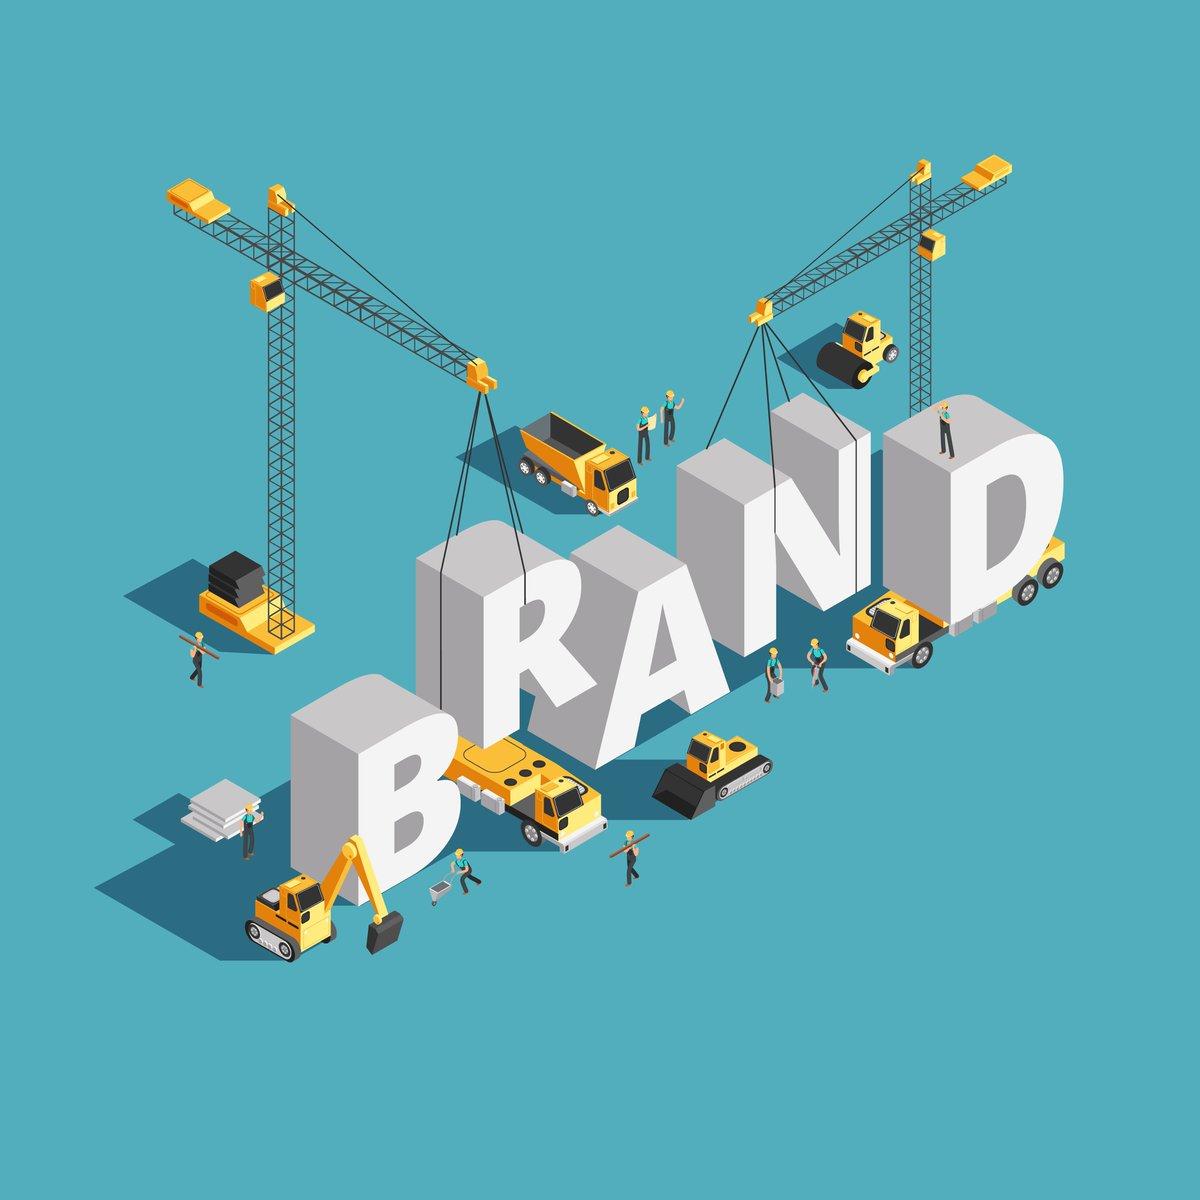 We visualize create brand designing. Contact us for designing your brand.  #visualize #create #brand #designing #contactus #agency #ardigitalmedia #branding #ahmedabad #digitalmarketing  https://t.co/ccp0bBhEaQ https://t.co/yYrZK0tWEO